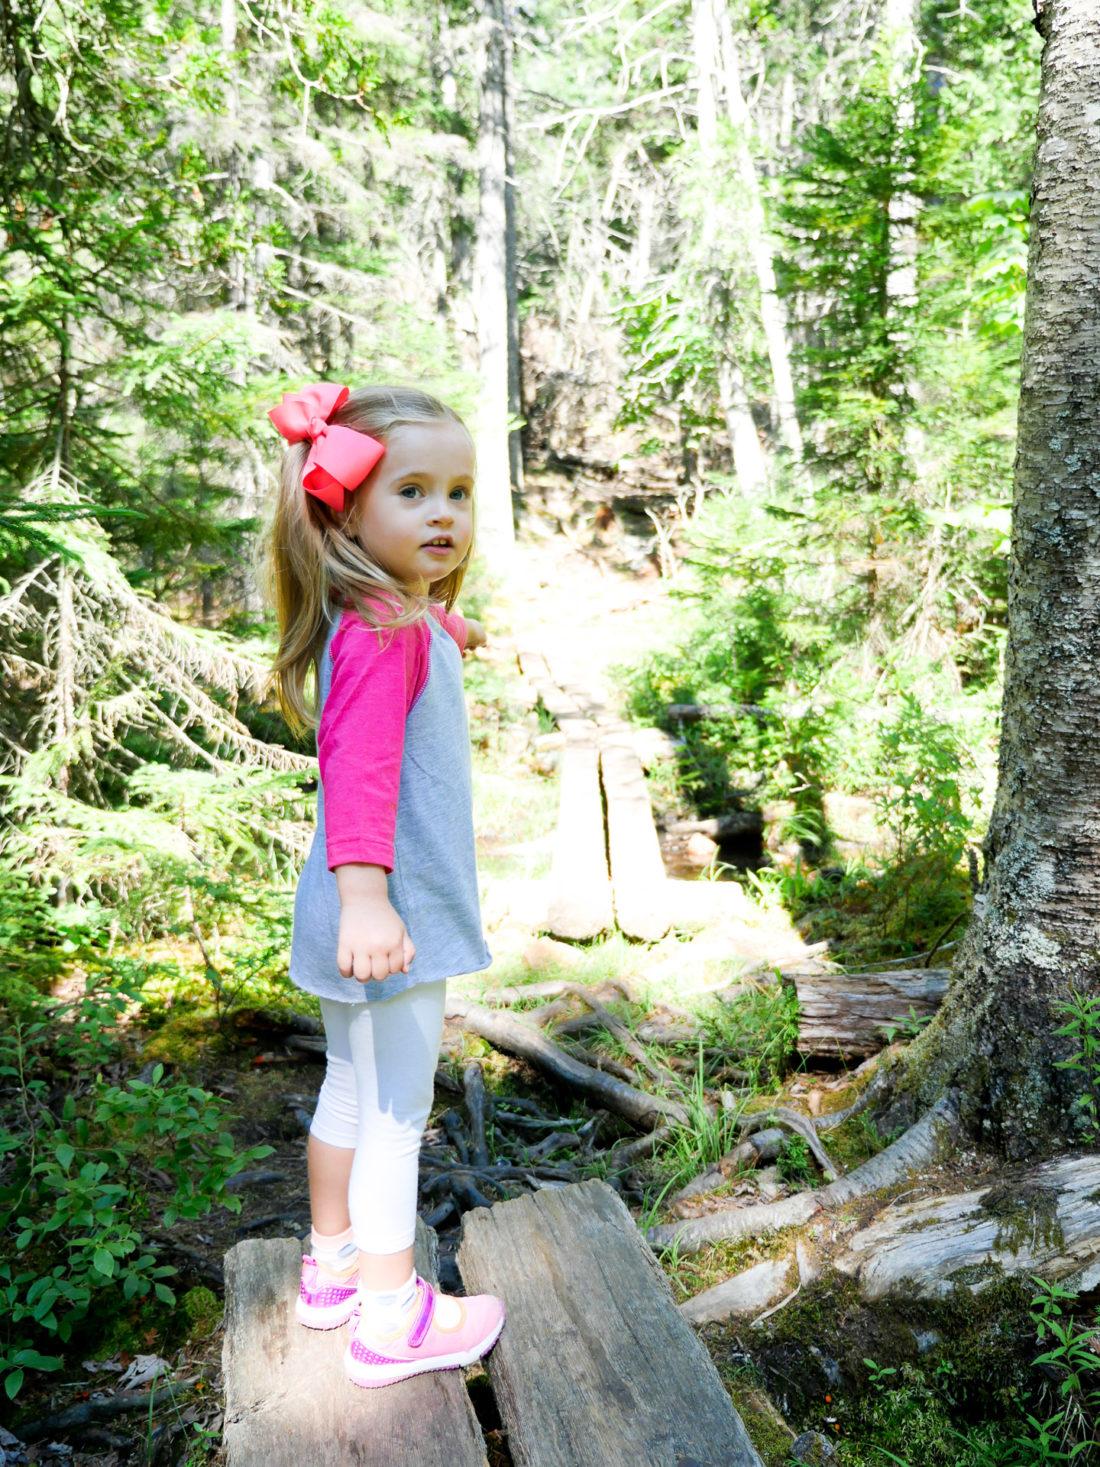 Marlowe Martino hikes in Acadia National Park